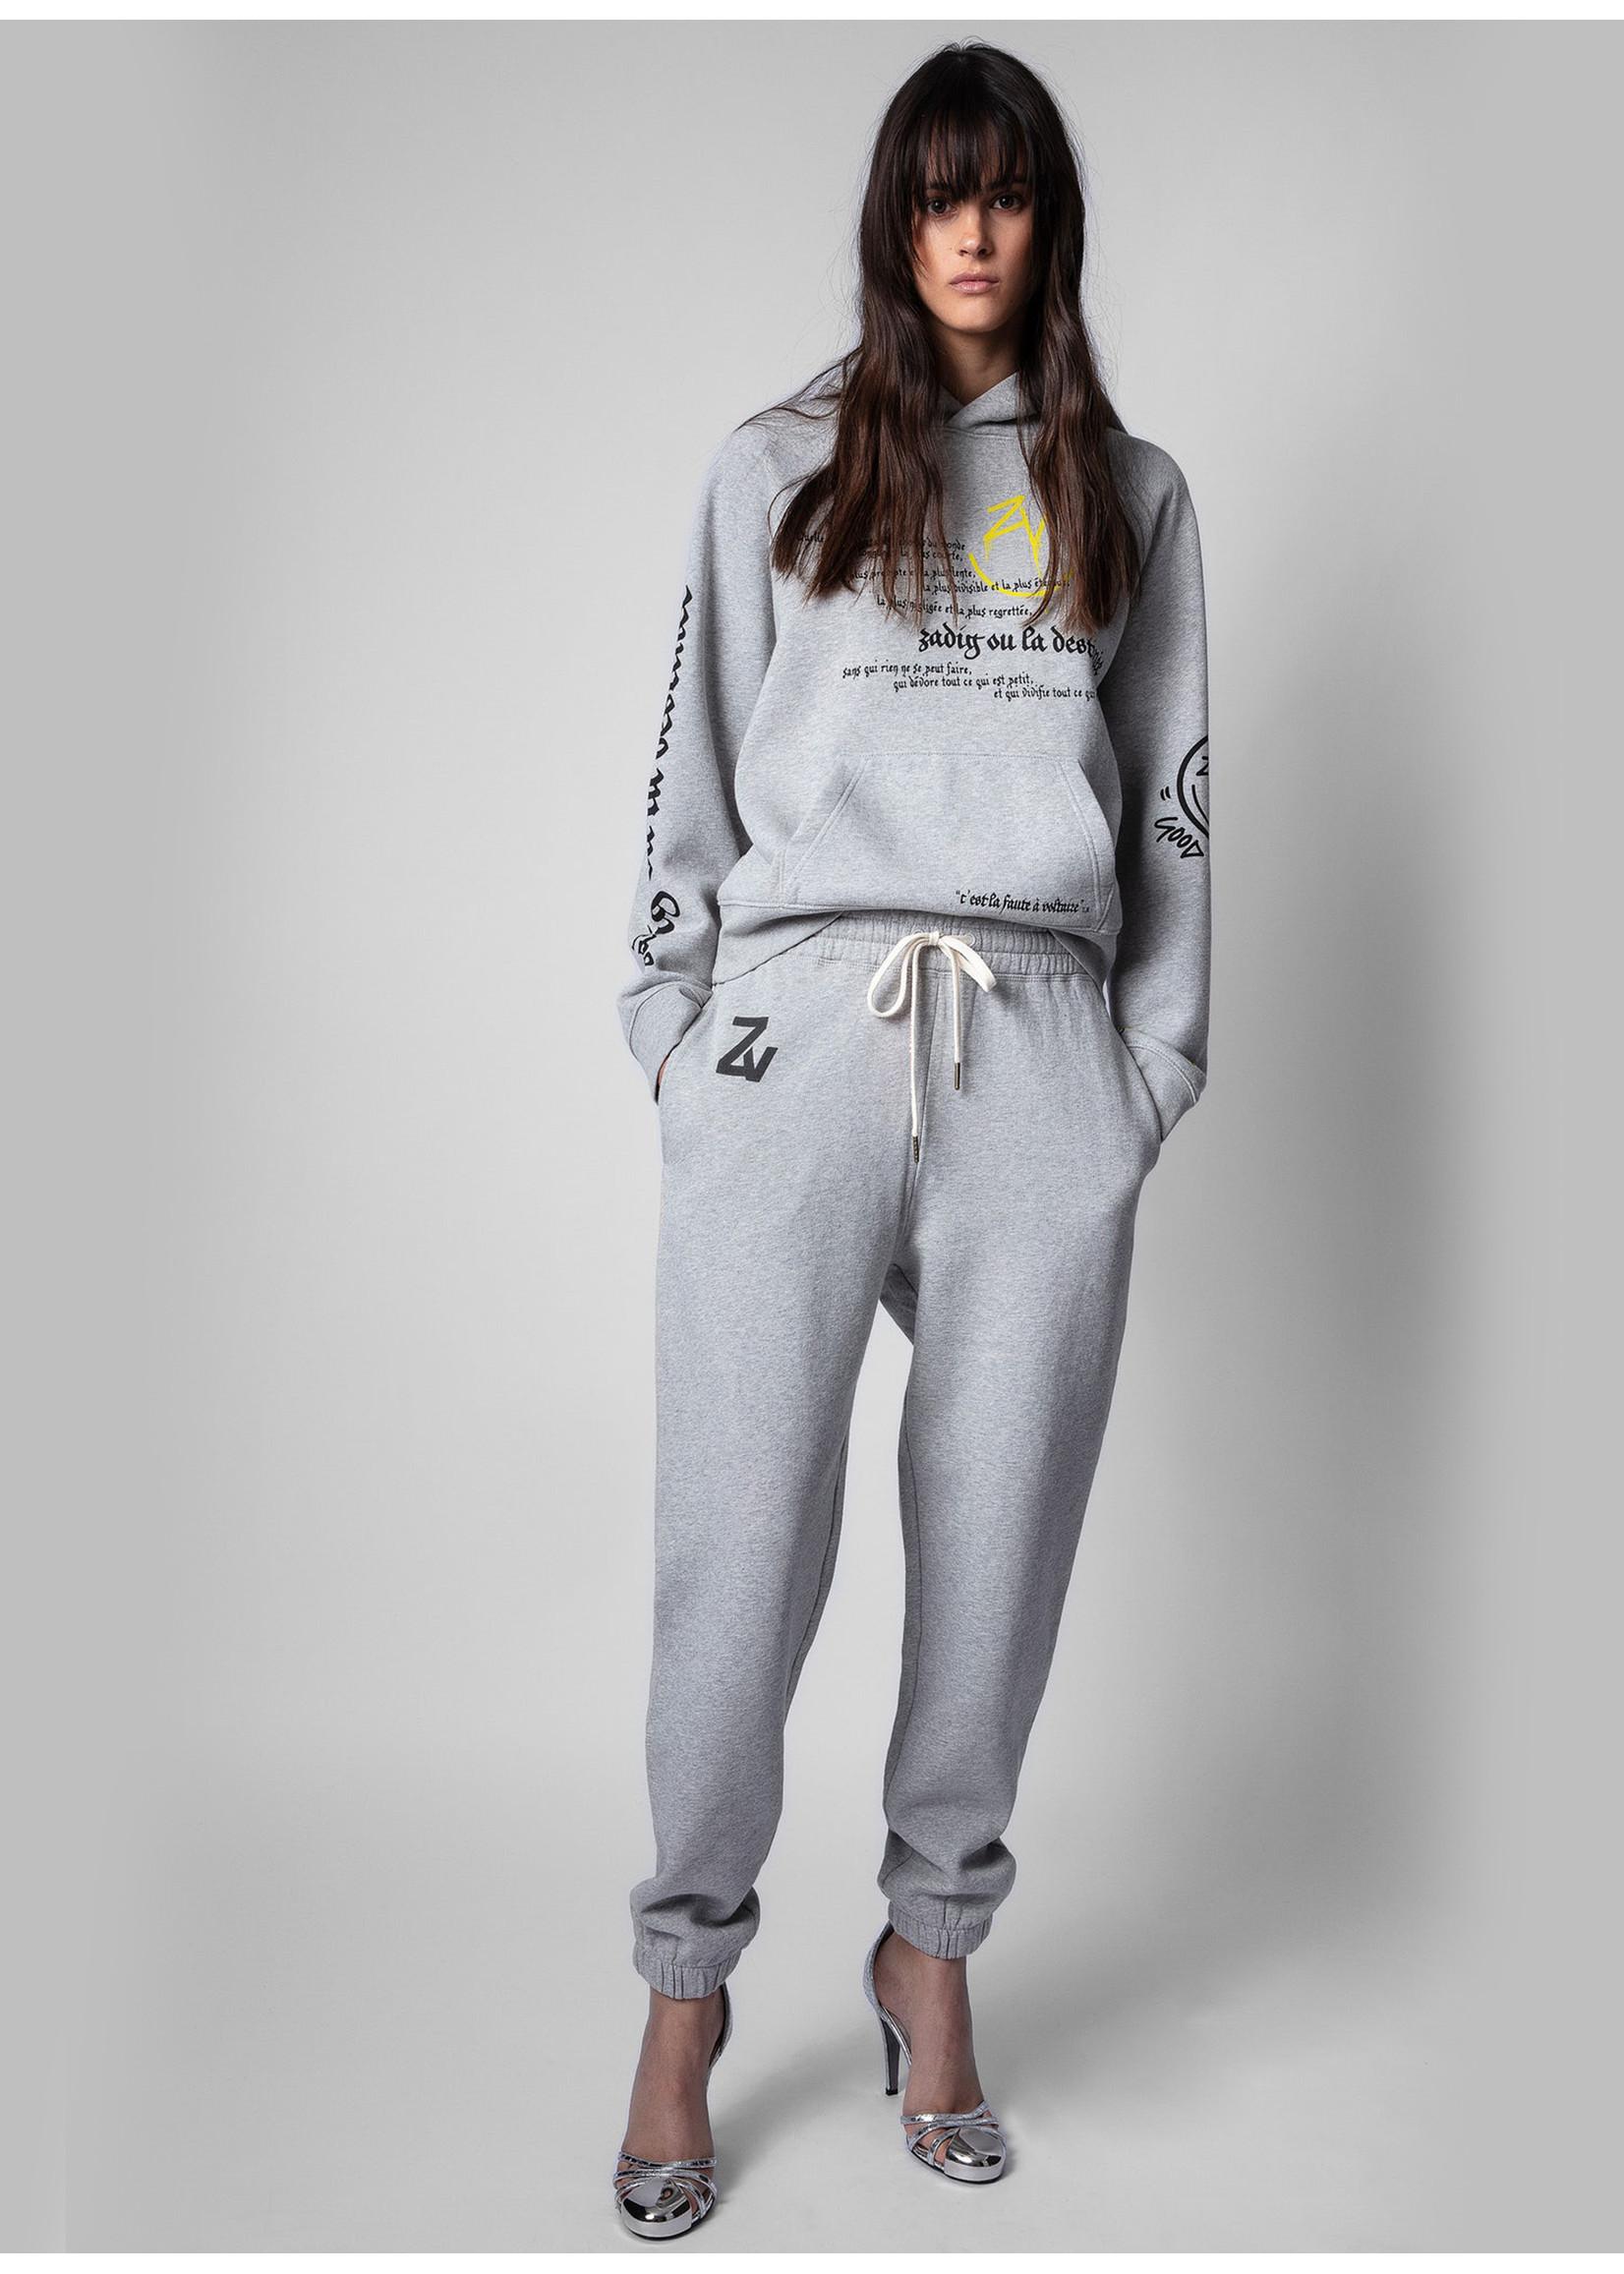 Zadig & Voltaire Steevy Trackpants grey